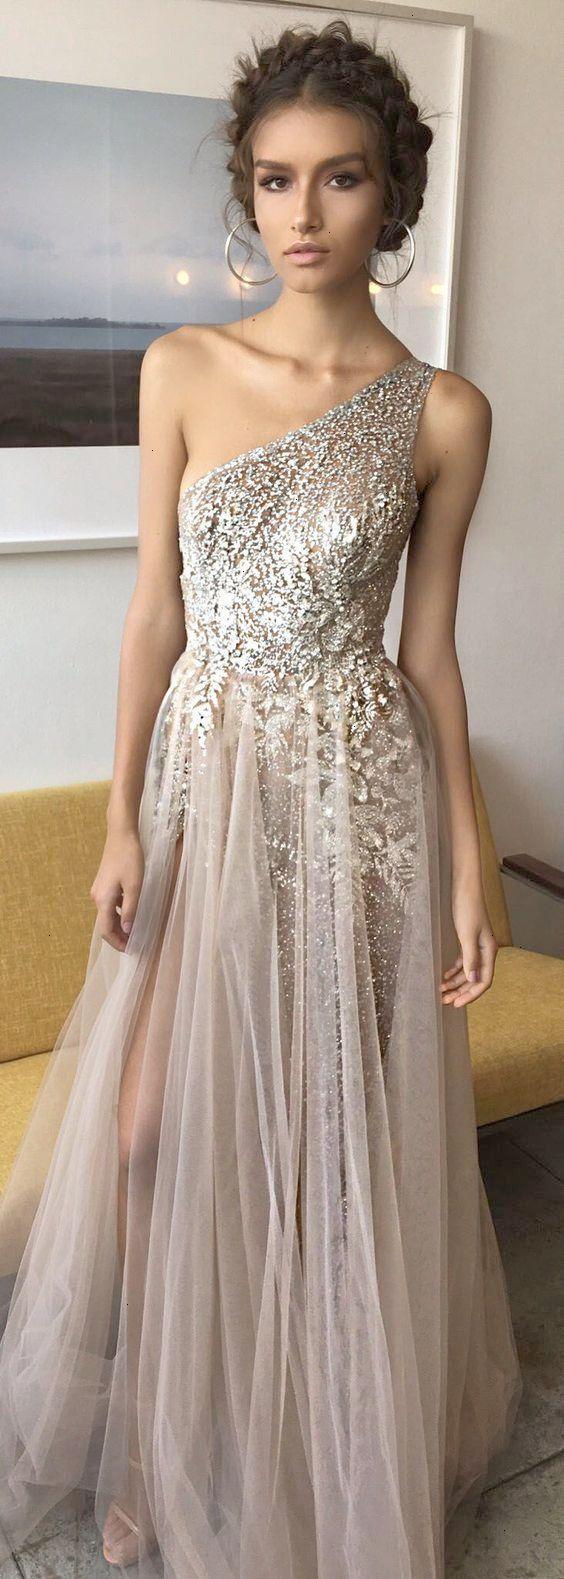 One shoulder shinning side split elegant long prom dresses wg